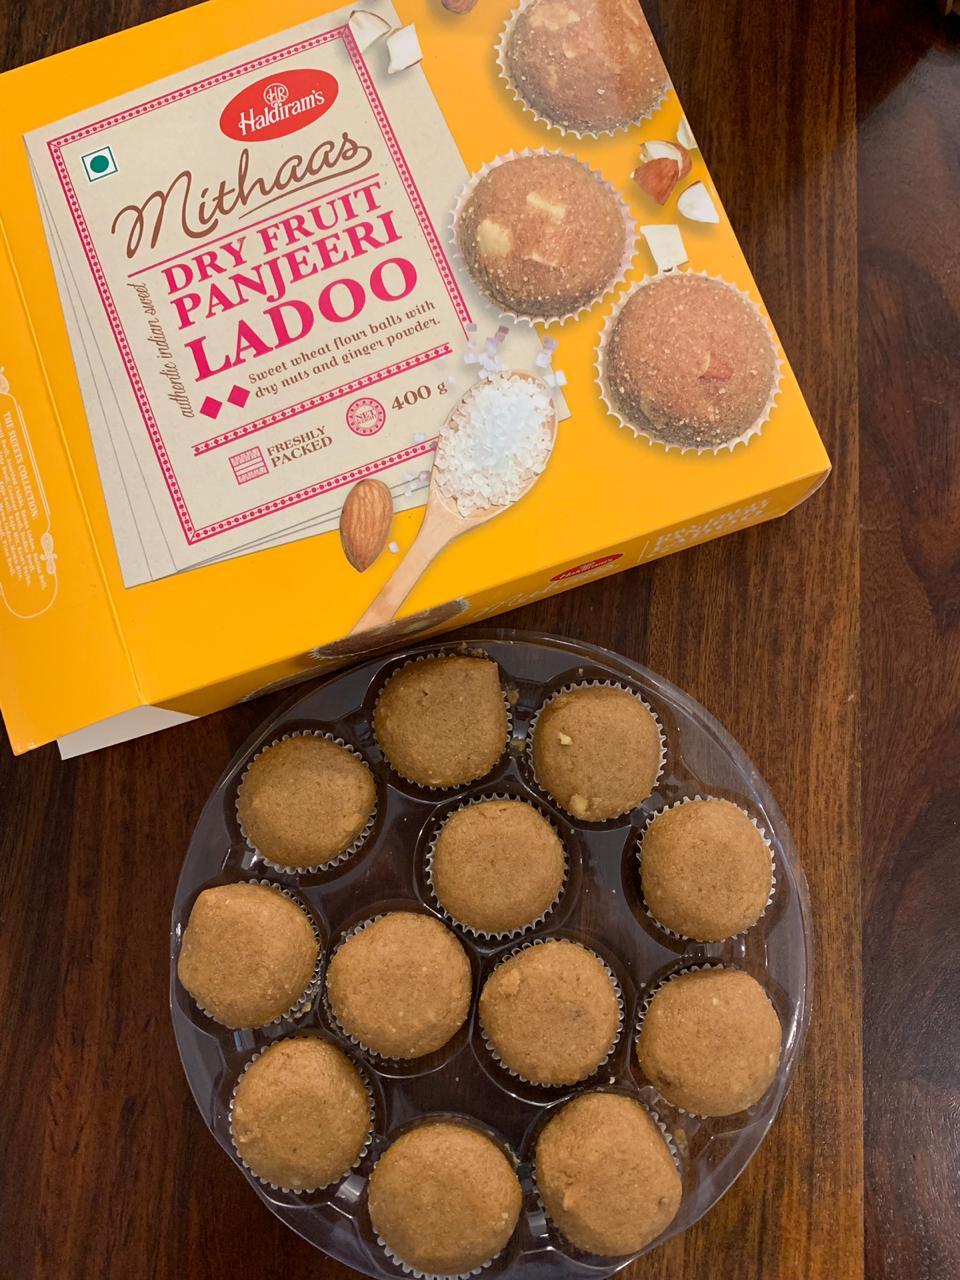 Haldiram's Mithaas Dry Fruit Panjeeri Ladooos: #FirstImpressions